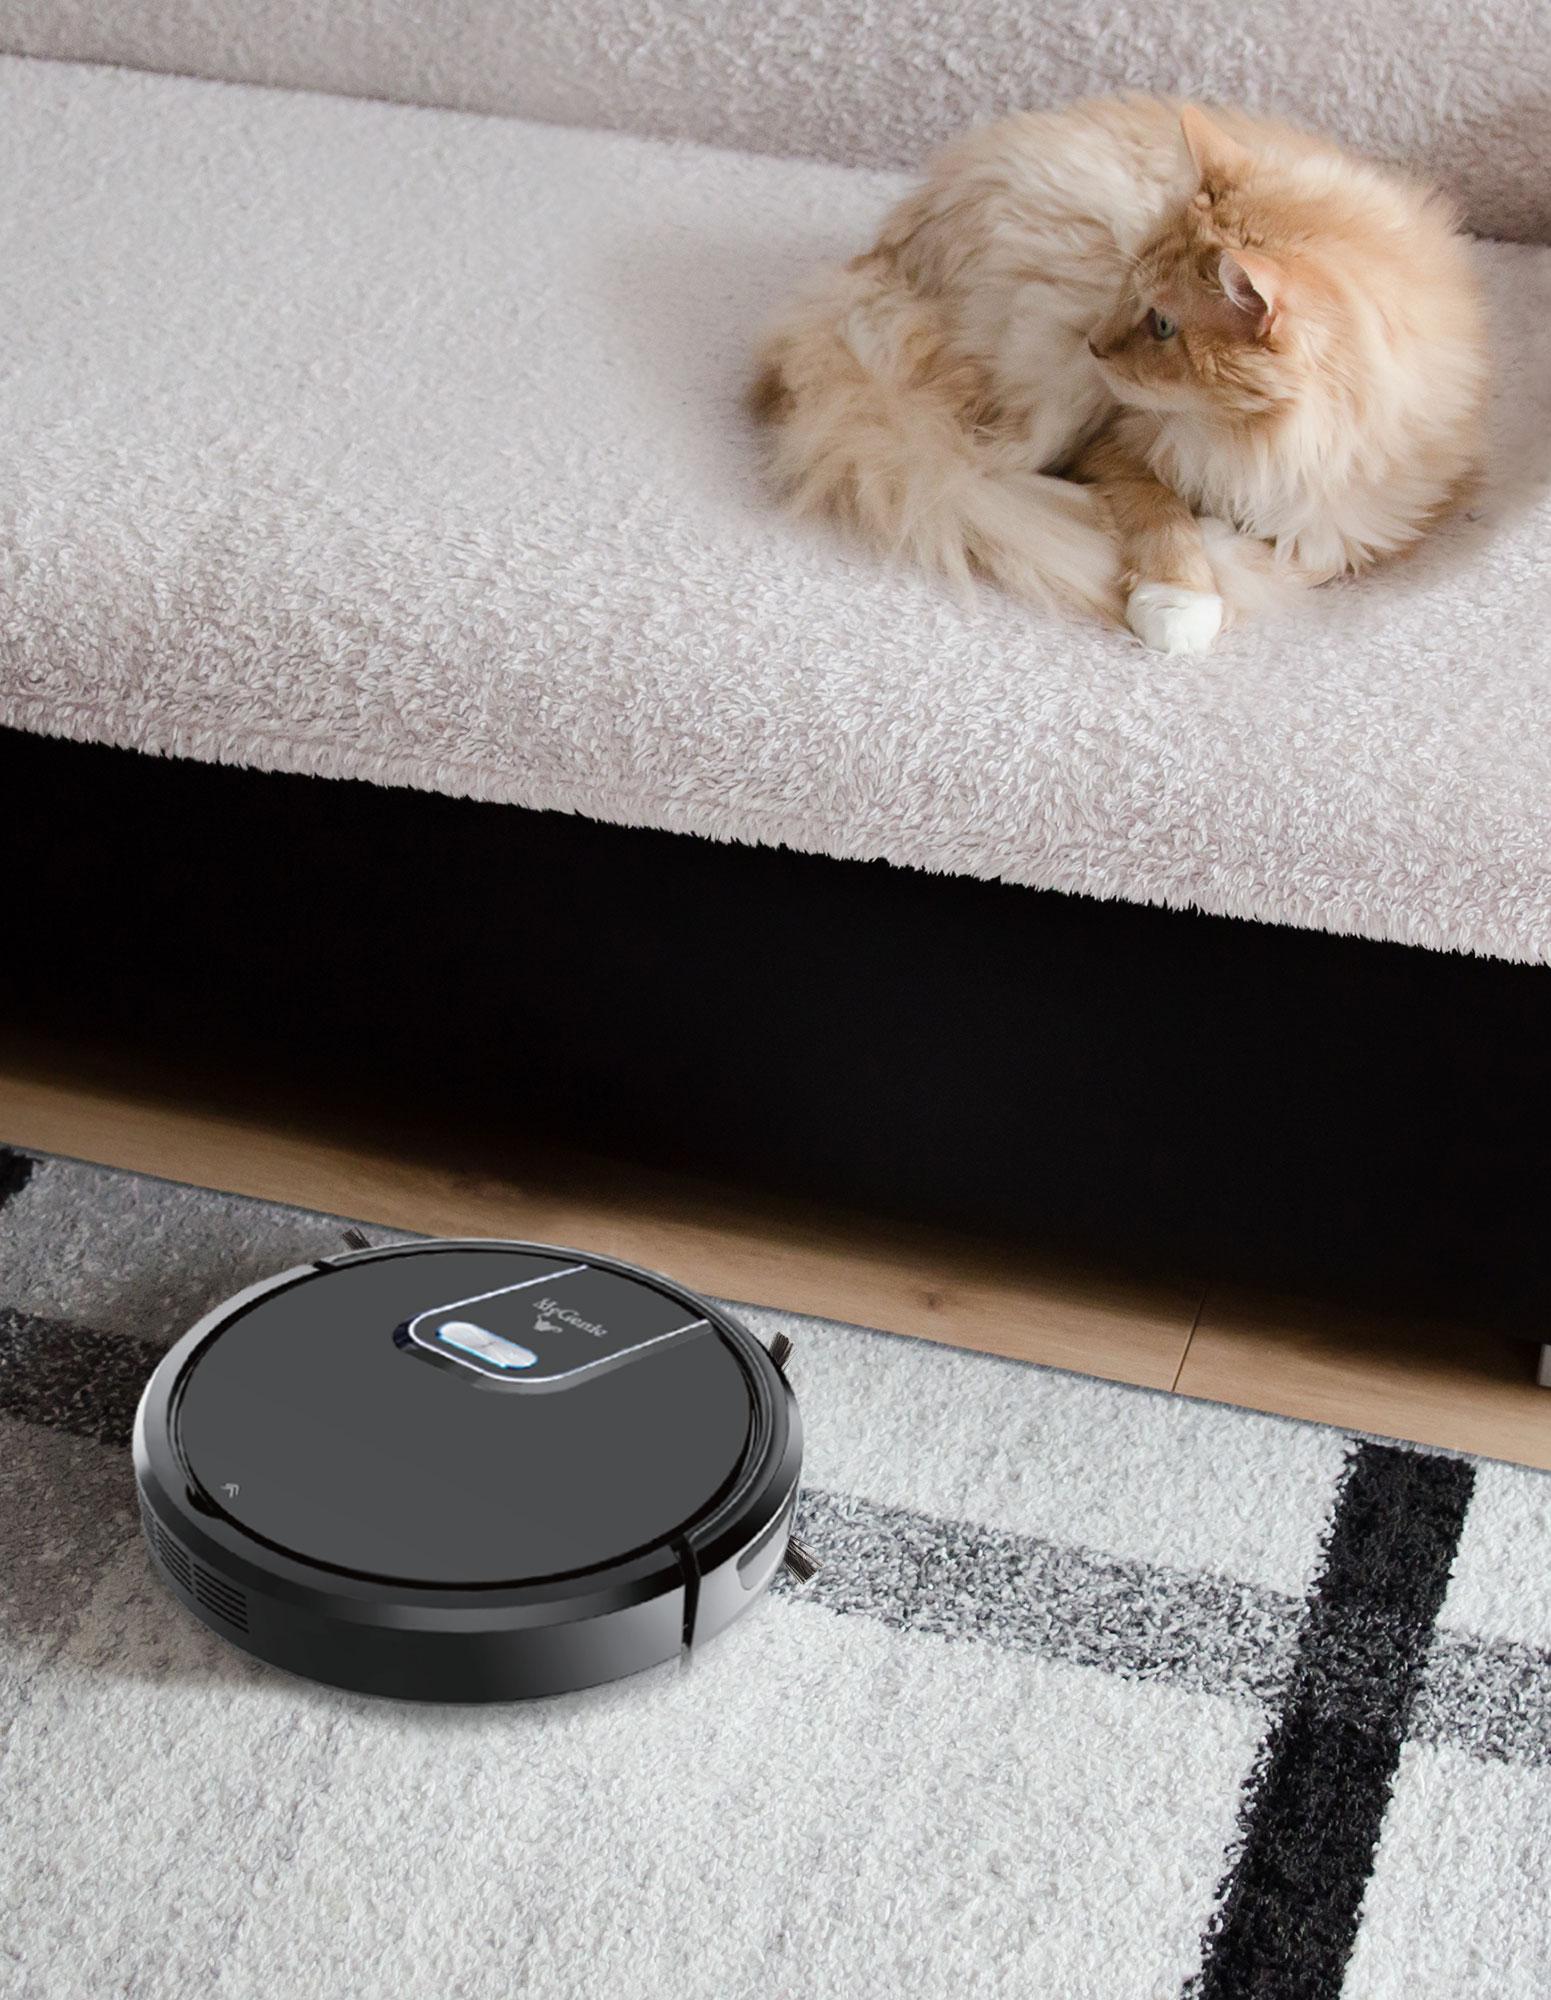 thumbnail 9 - MyGenie WI-FI GMAX Robotic Vacuum Cleaner Mop App Control Dry & Wet Auto Robot